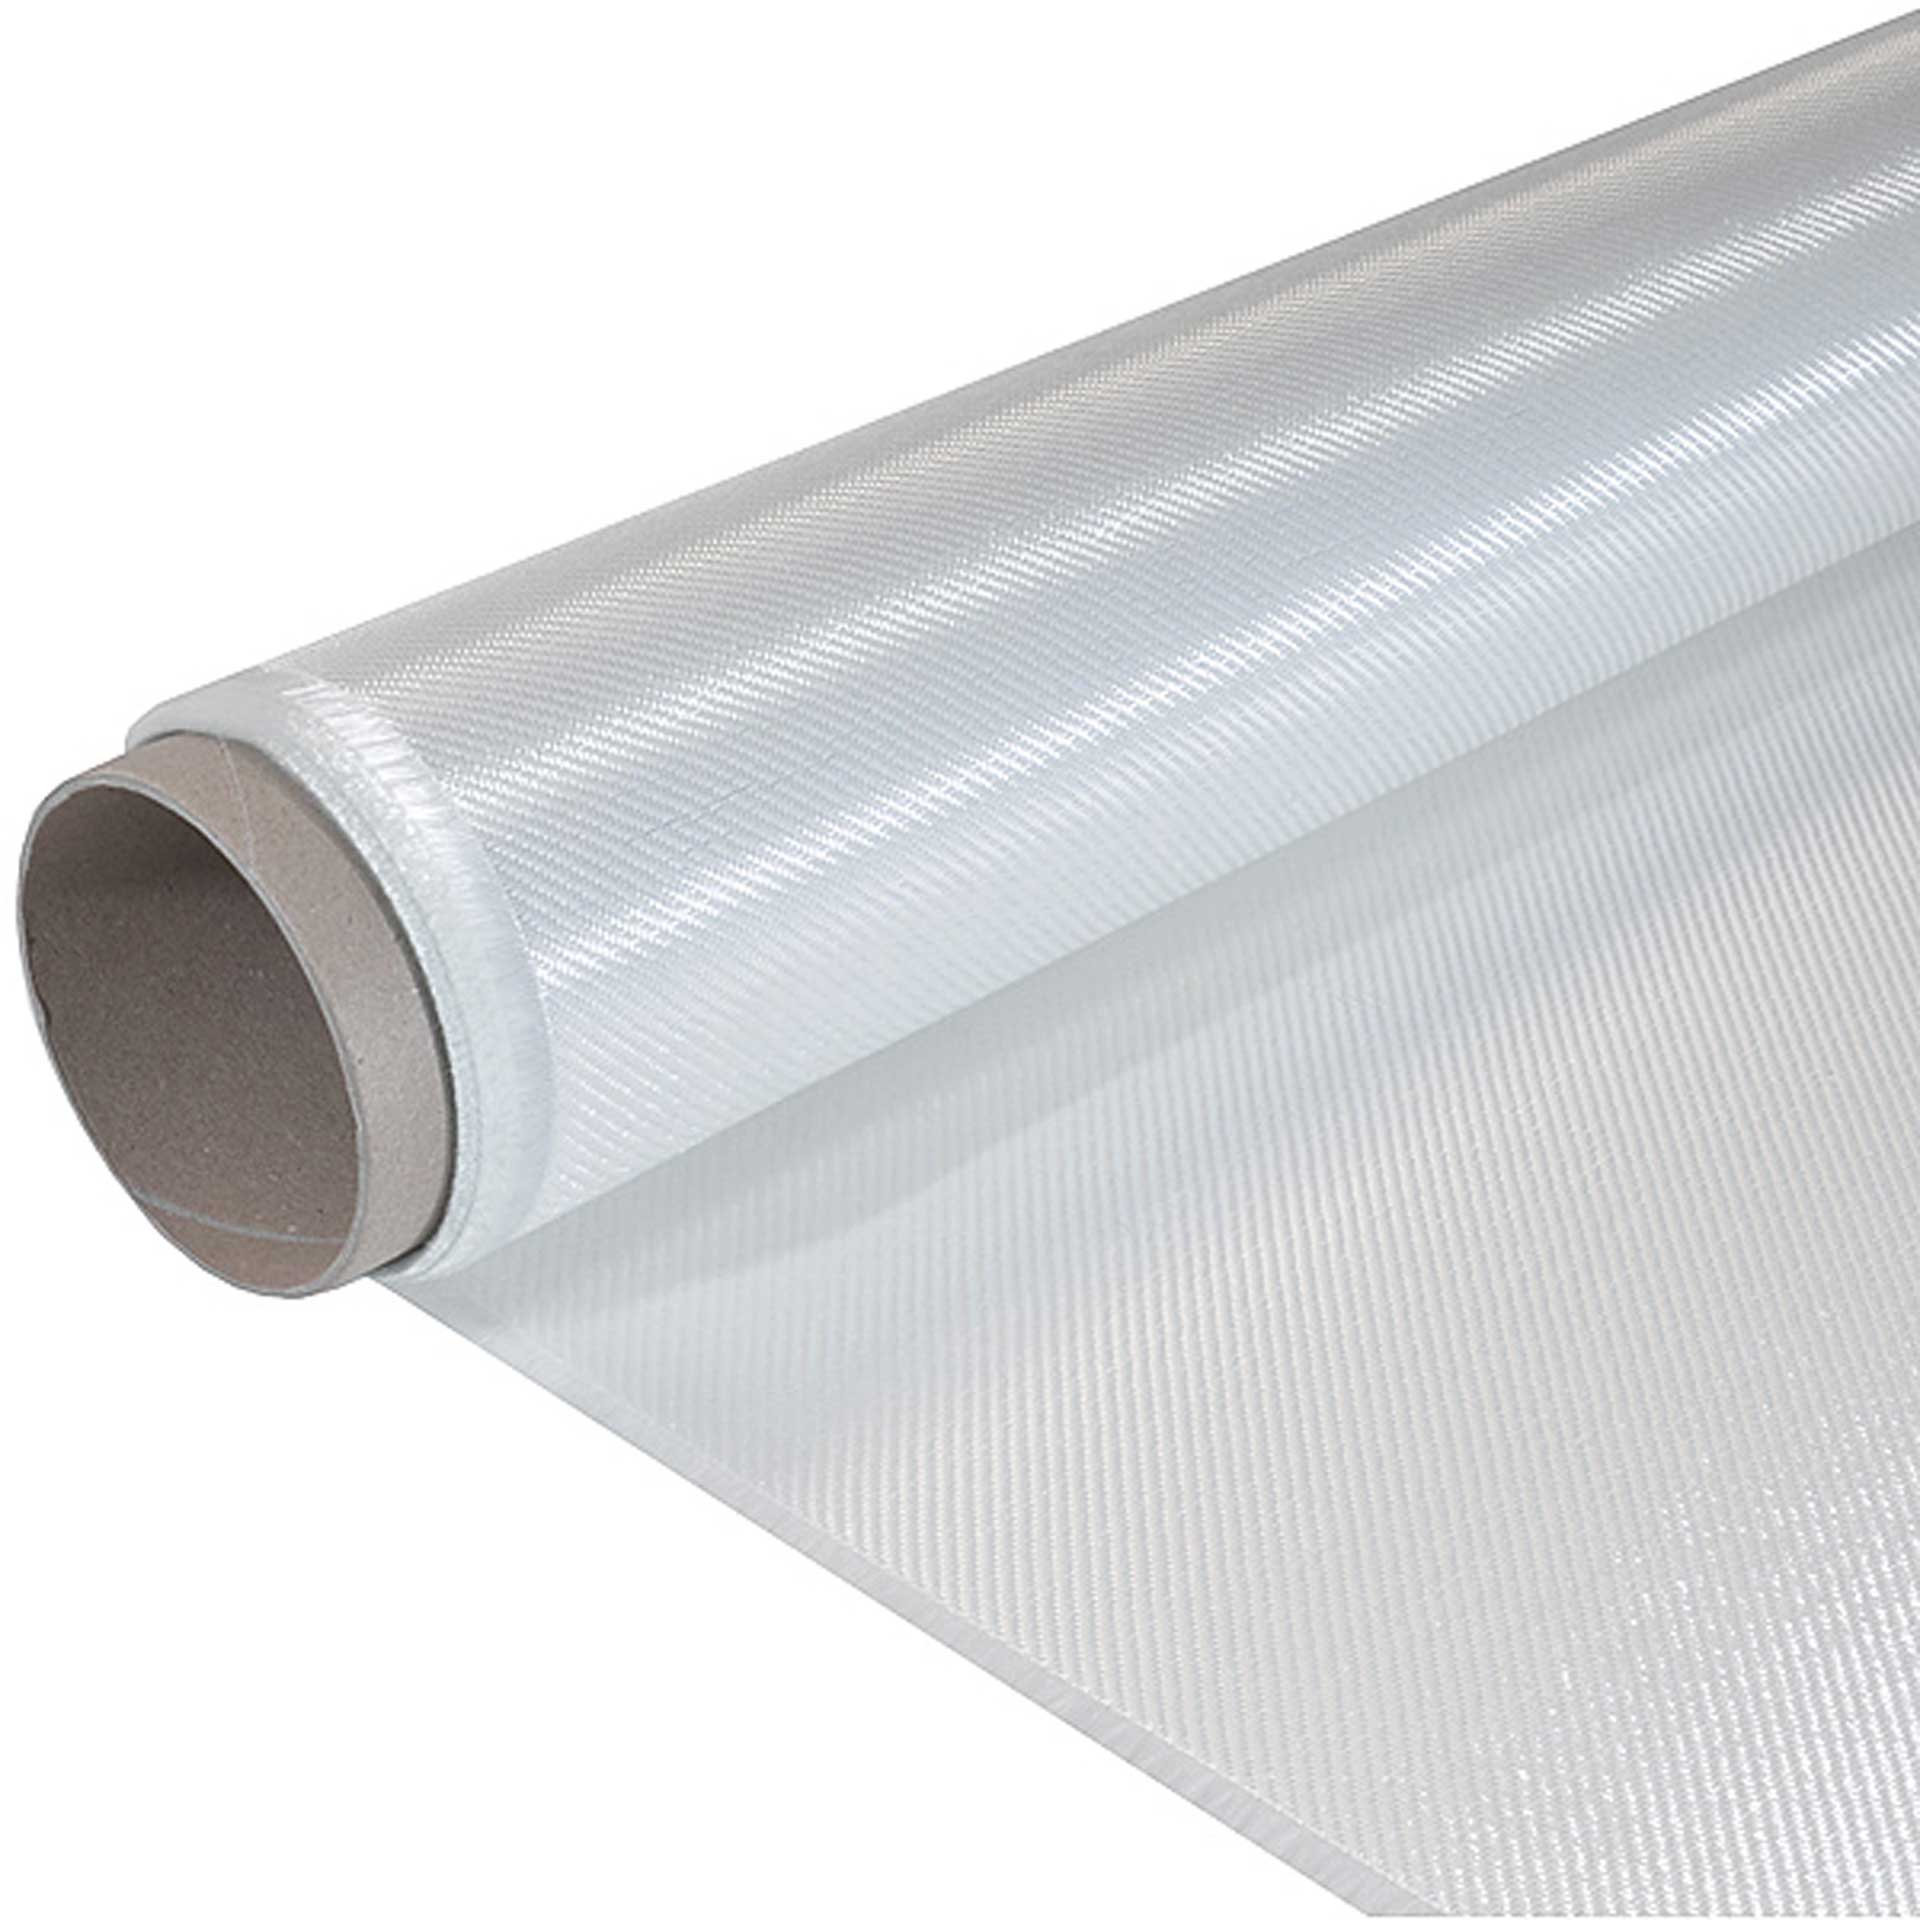 R&G Glasgewebe 80 g/m² (Köper) 100 cm, Rolle/ 5 m